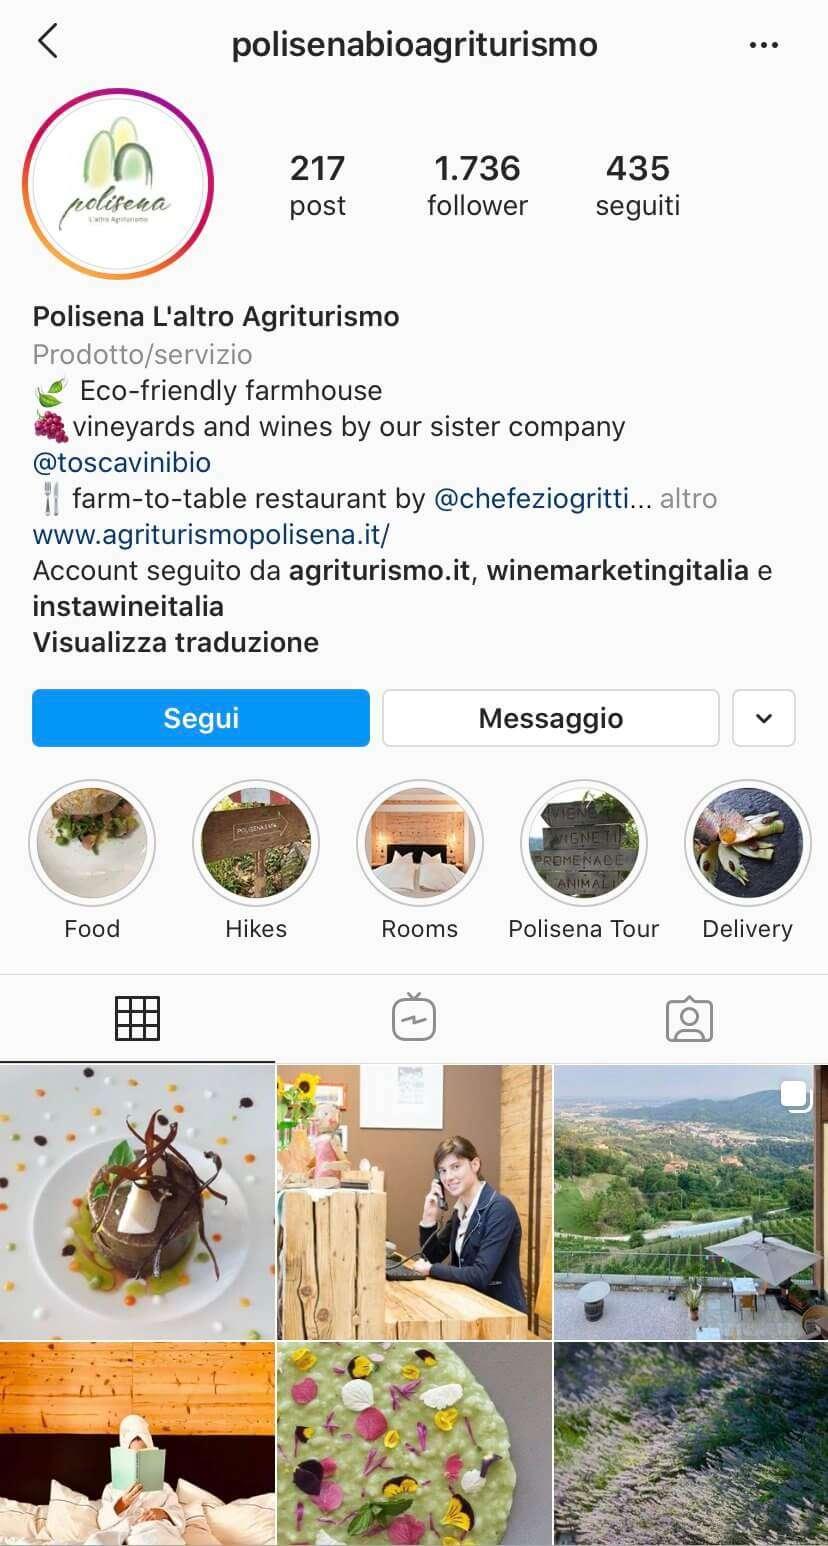 posizioniamento cantina e agriturismo Instagram